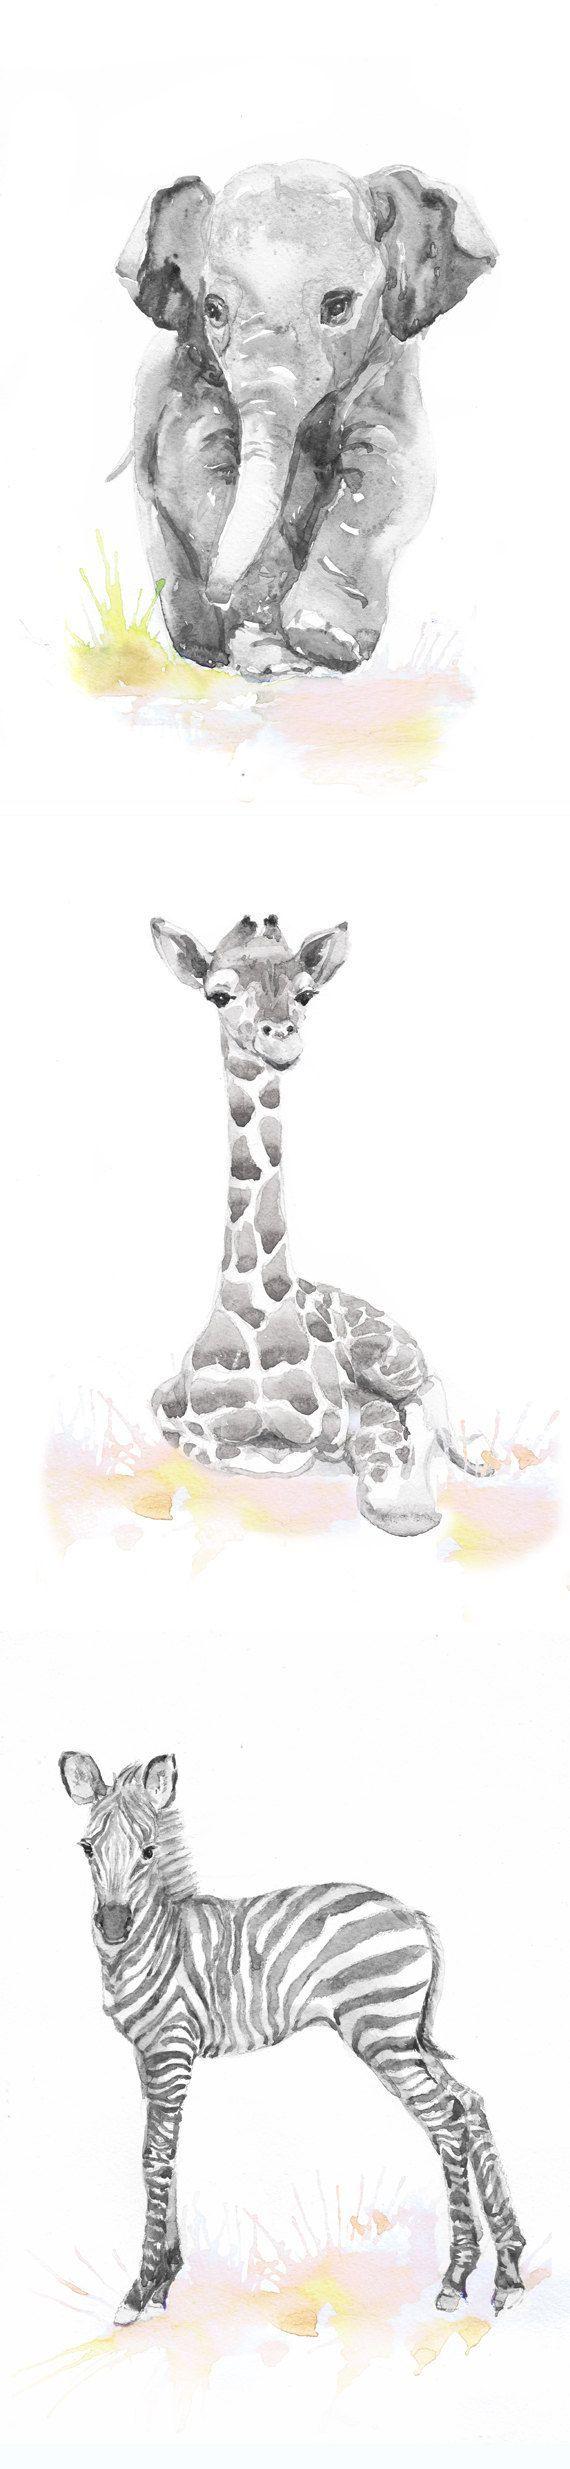 Neutral Nursery Decor, Set of 3 prints, Baby Animals Nursery , Watercolor painting, Safari Wall Art Watercolour Print, New baby Gift, Jungle Set of 3